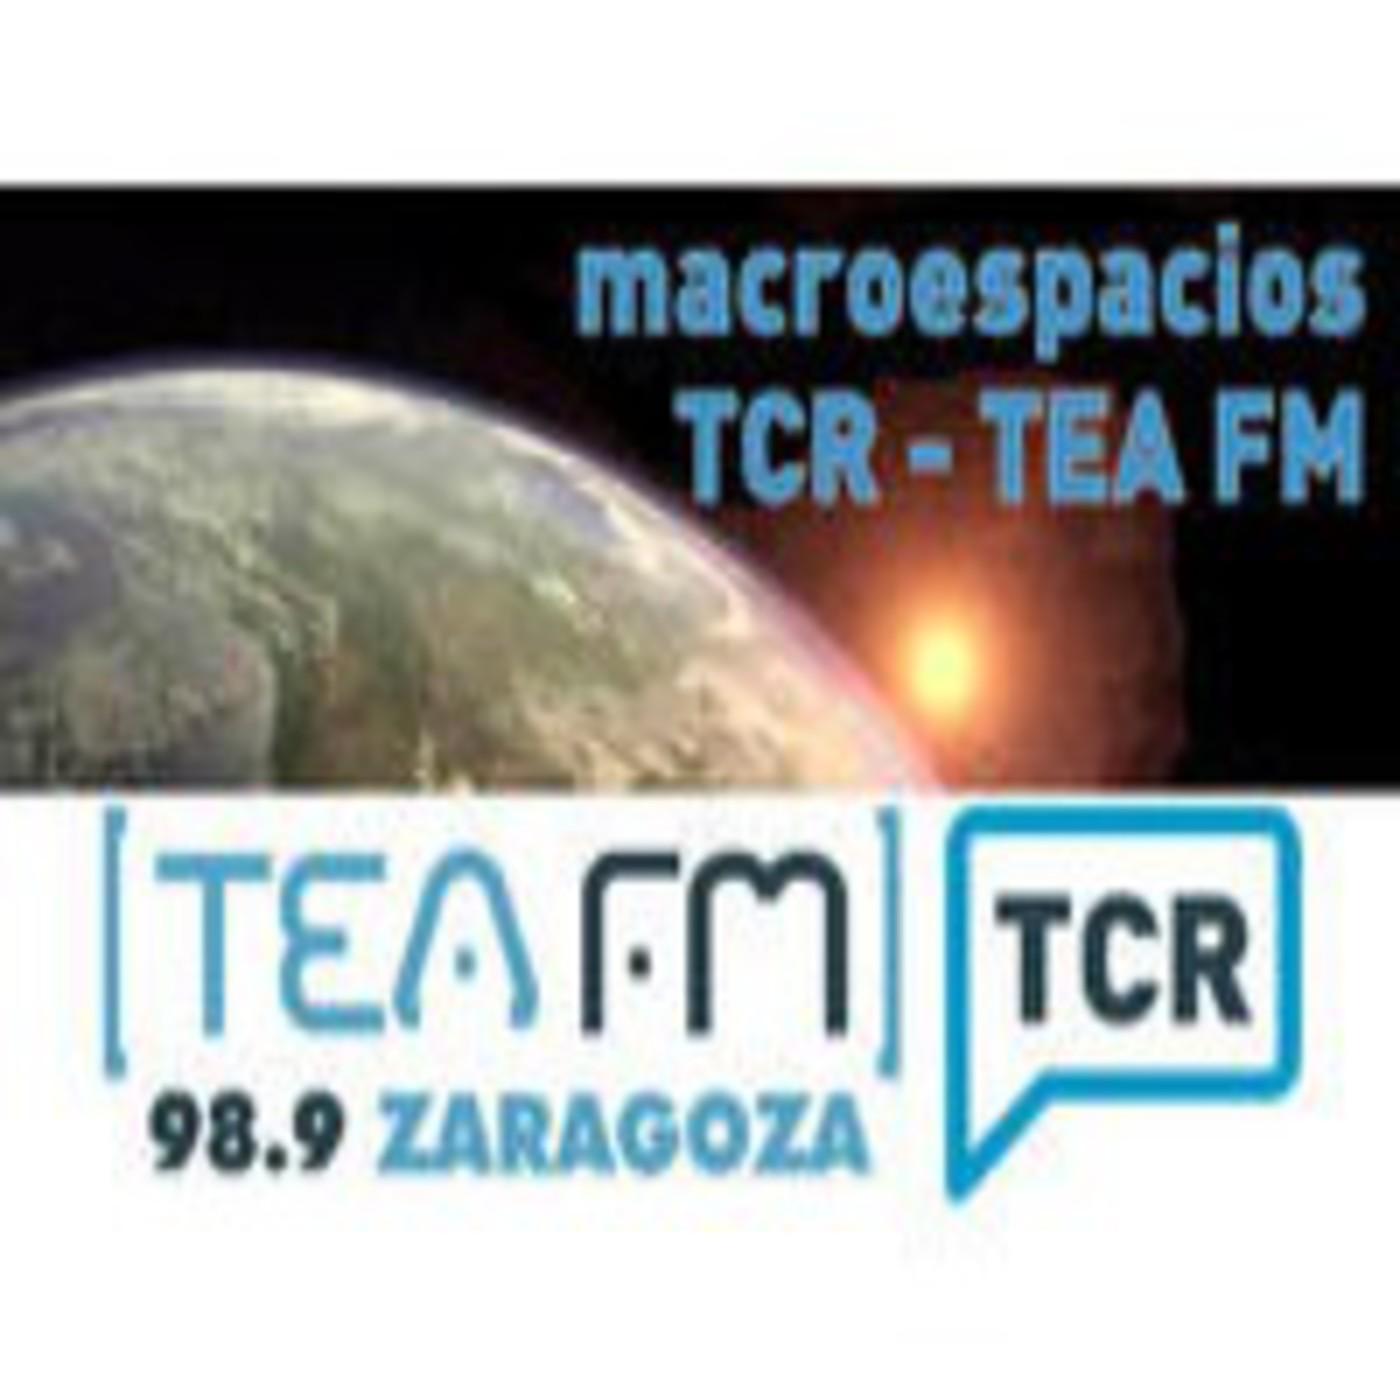 <![CDATA[Macroespacios TCR-TEA FM]]>